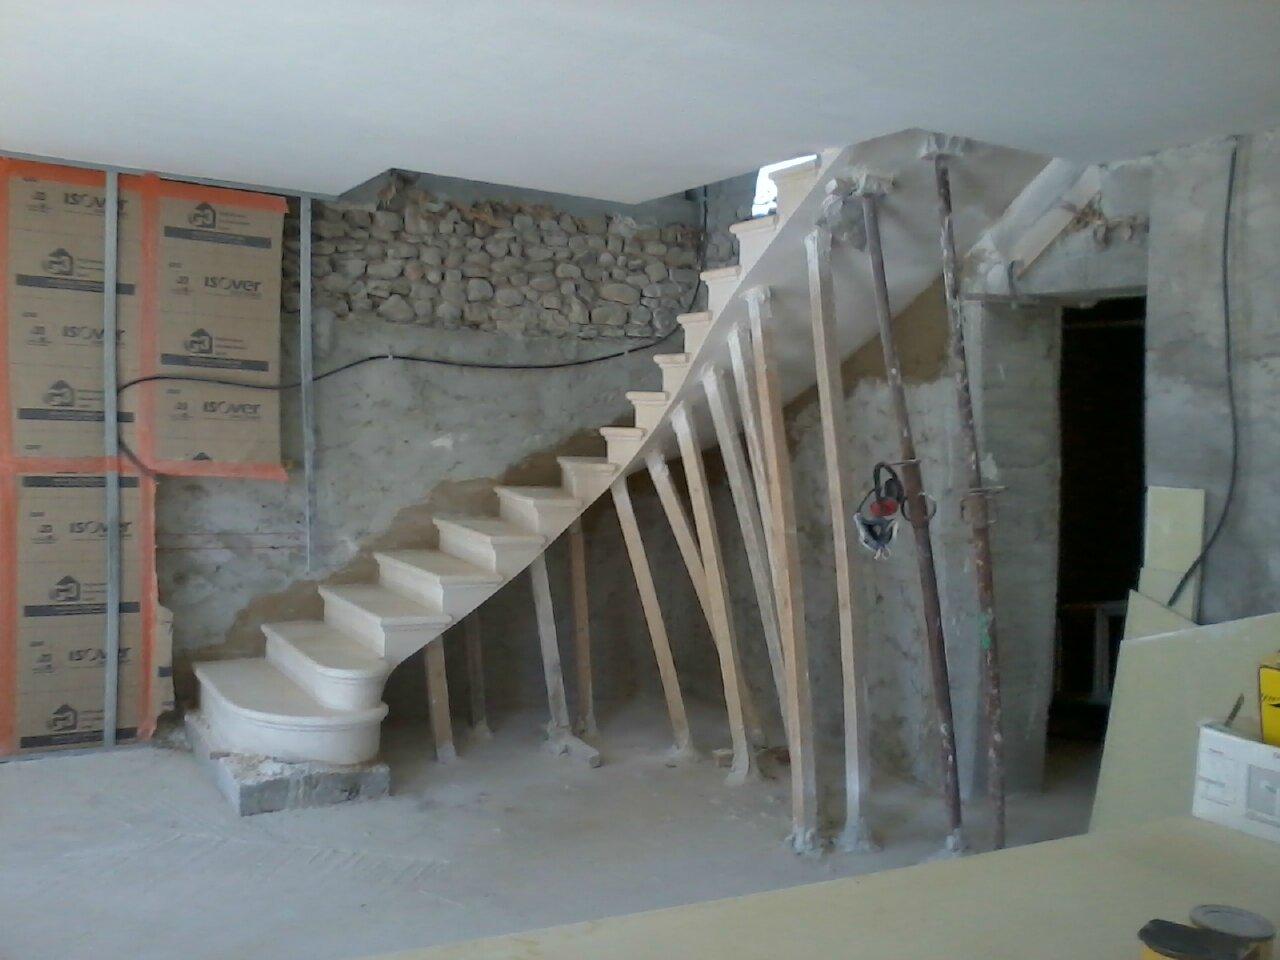 escalier massif autoportant 1 4 tournant tailleur de pierre thomas girard. Black Bedroom Furniture Sets. Home Design Ideas